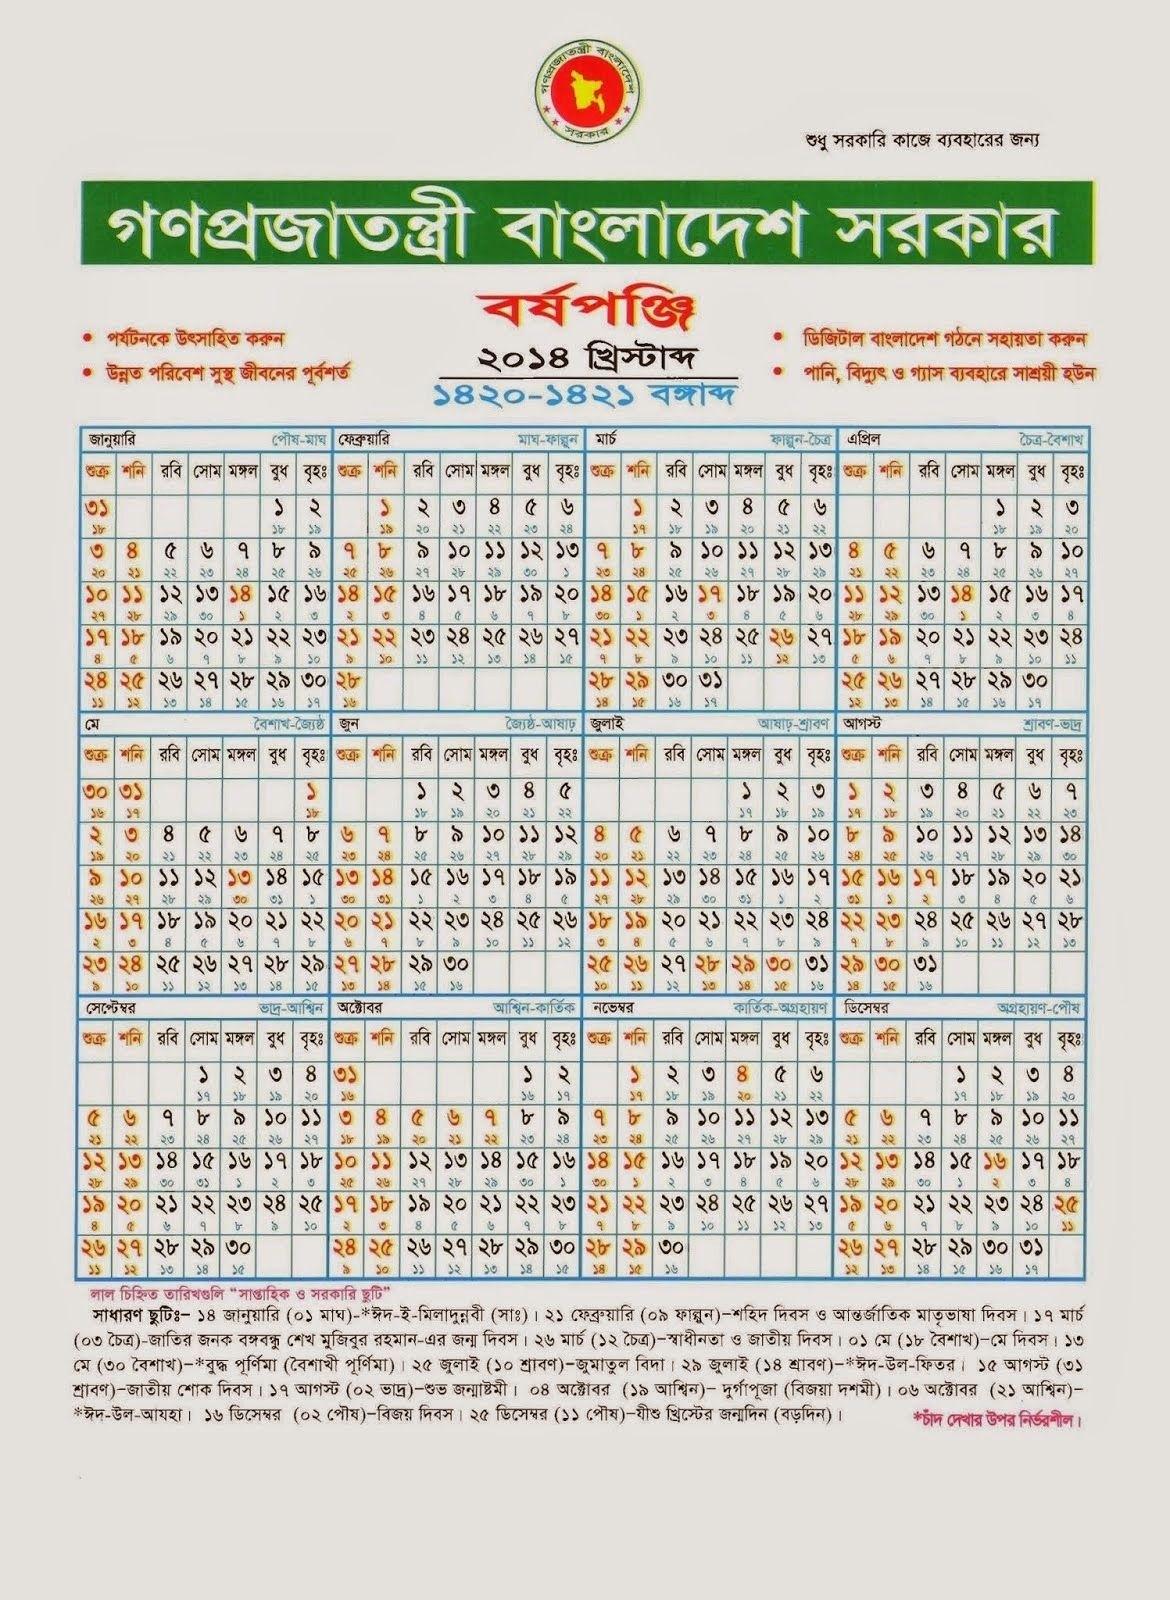 Bihar Sarkar Holiday Calendar 2018 Image  Template regarding 2018 Bihar Sarkar Calendar